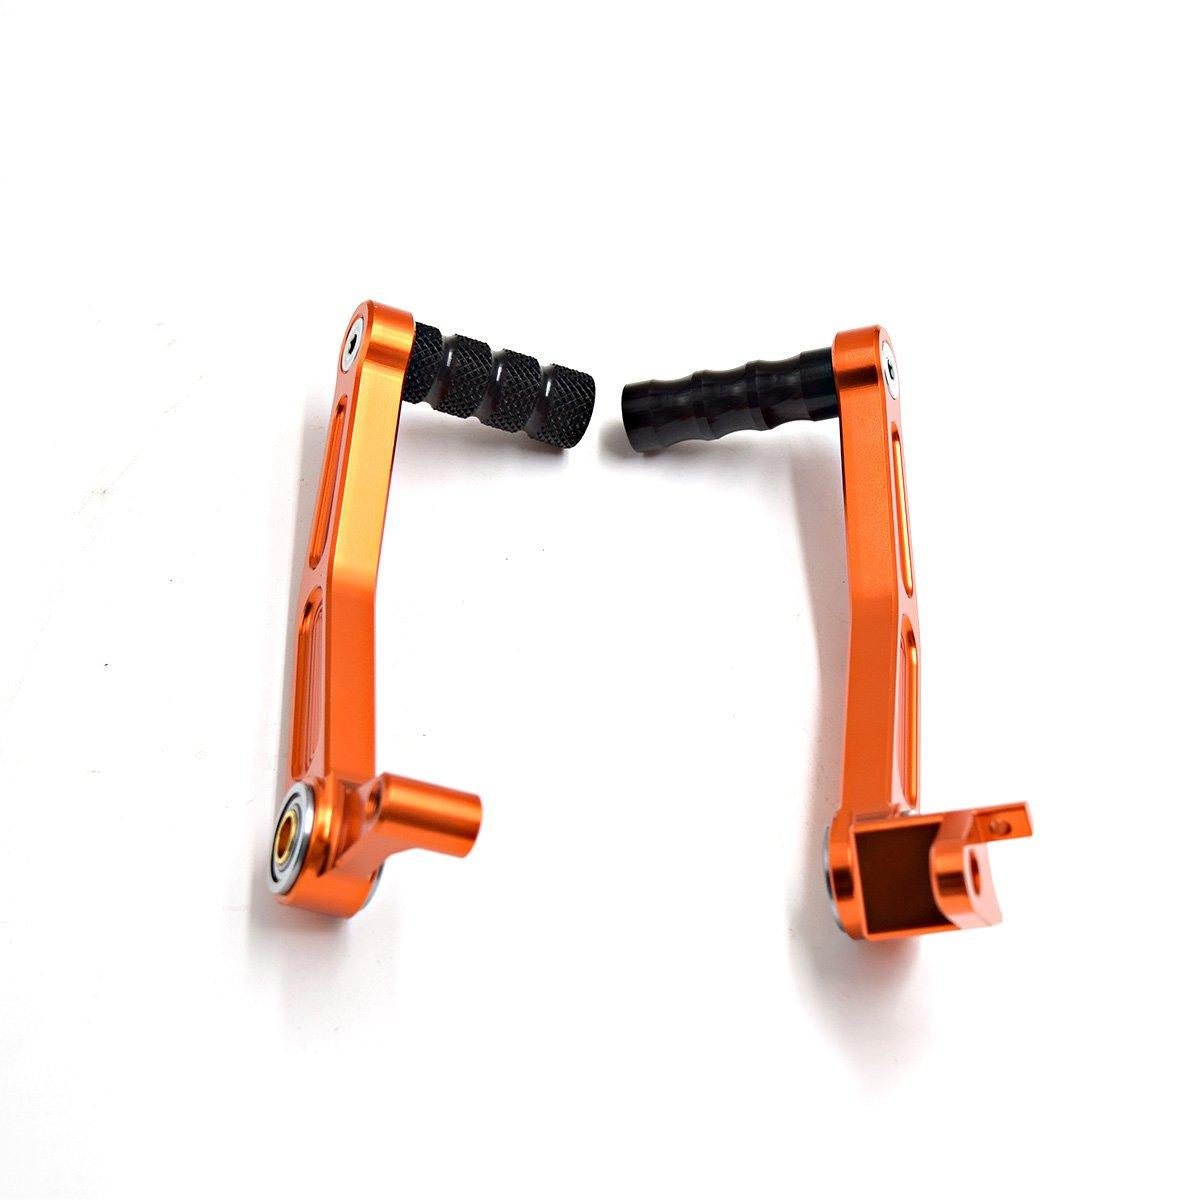 Frenos de la palanca de la motocicleta Pedales Palanca del cambio del engranaje del freno para Duke 125 200 390 RC125 / RC200 / Rc390 Palanca del pedal ...